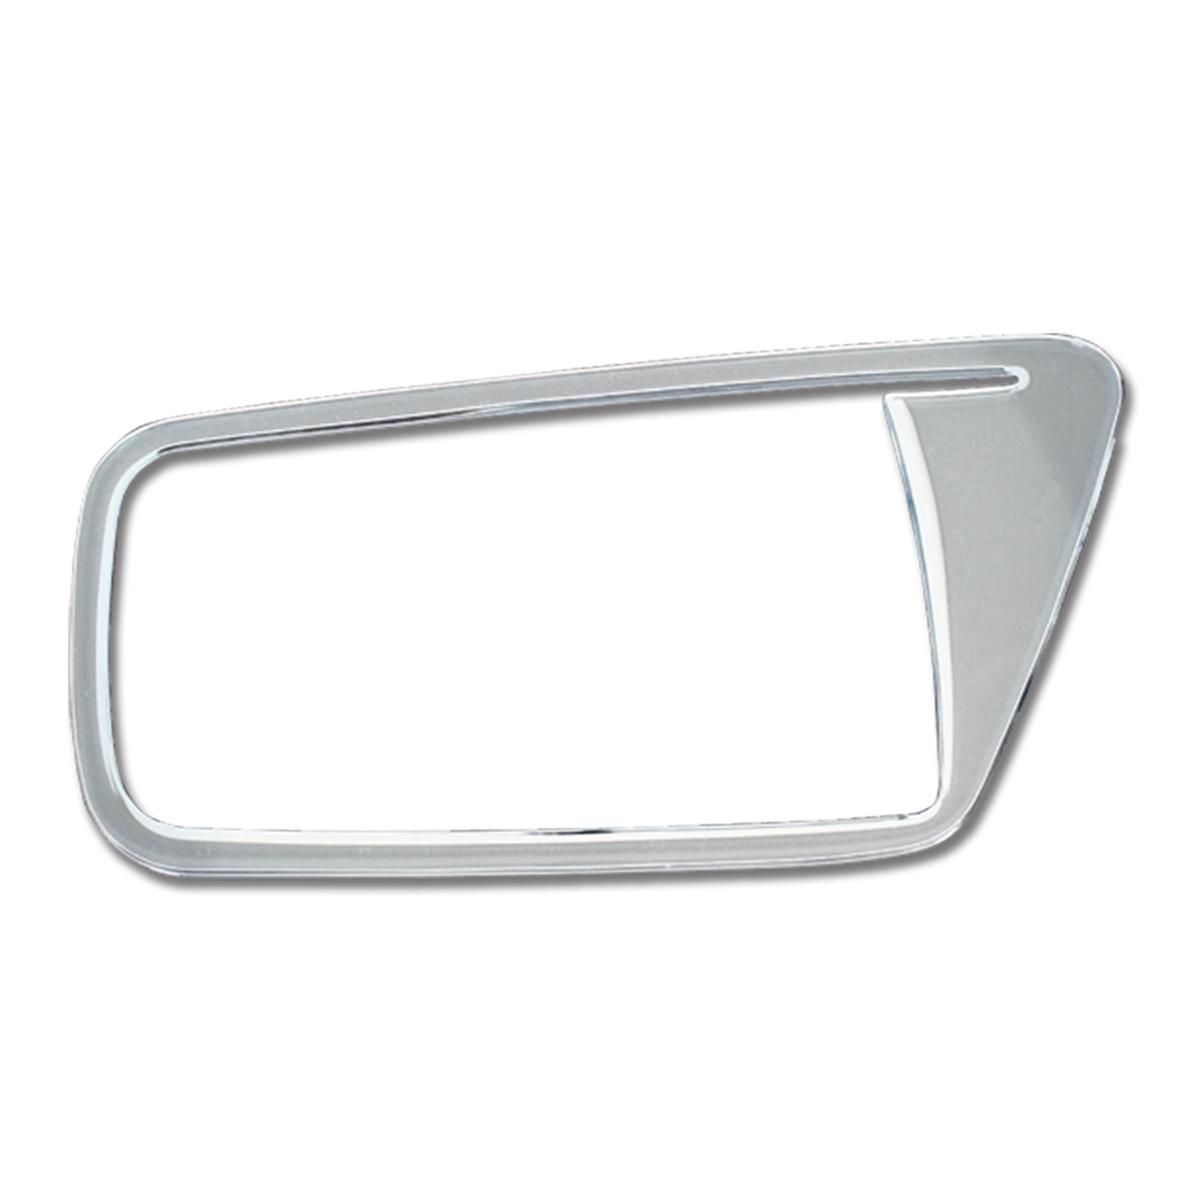 Grand General 68929 Plastic Chrome Driver Side Interior Door Ring for Kenworth